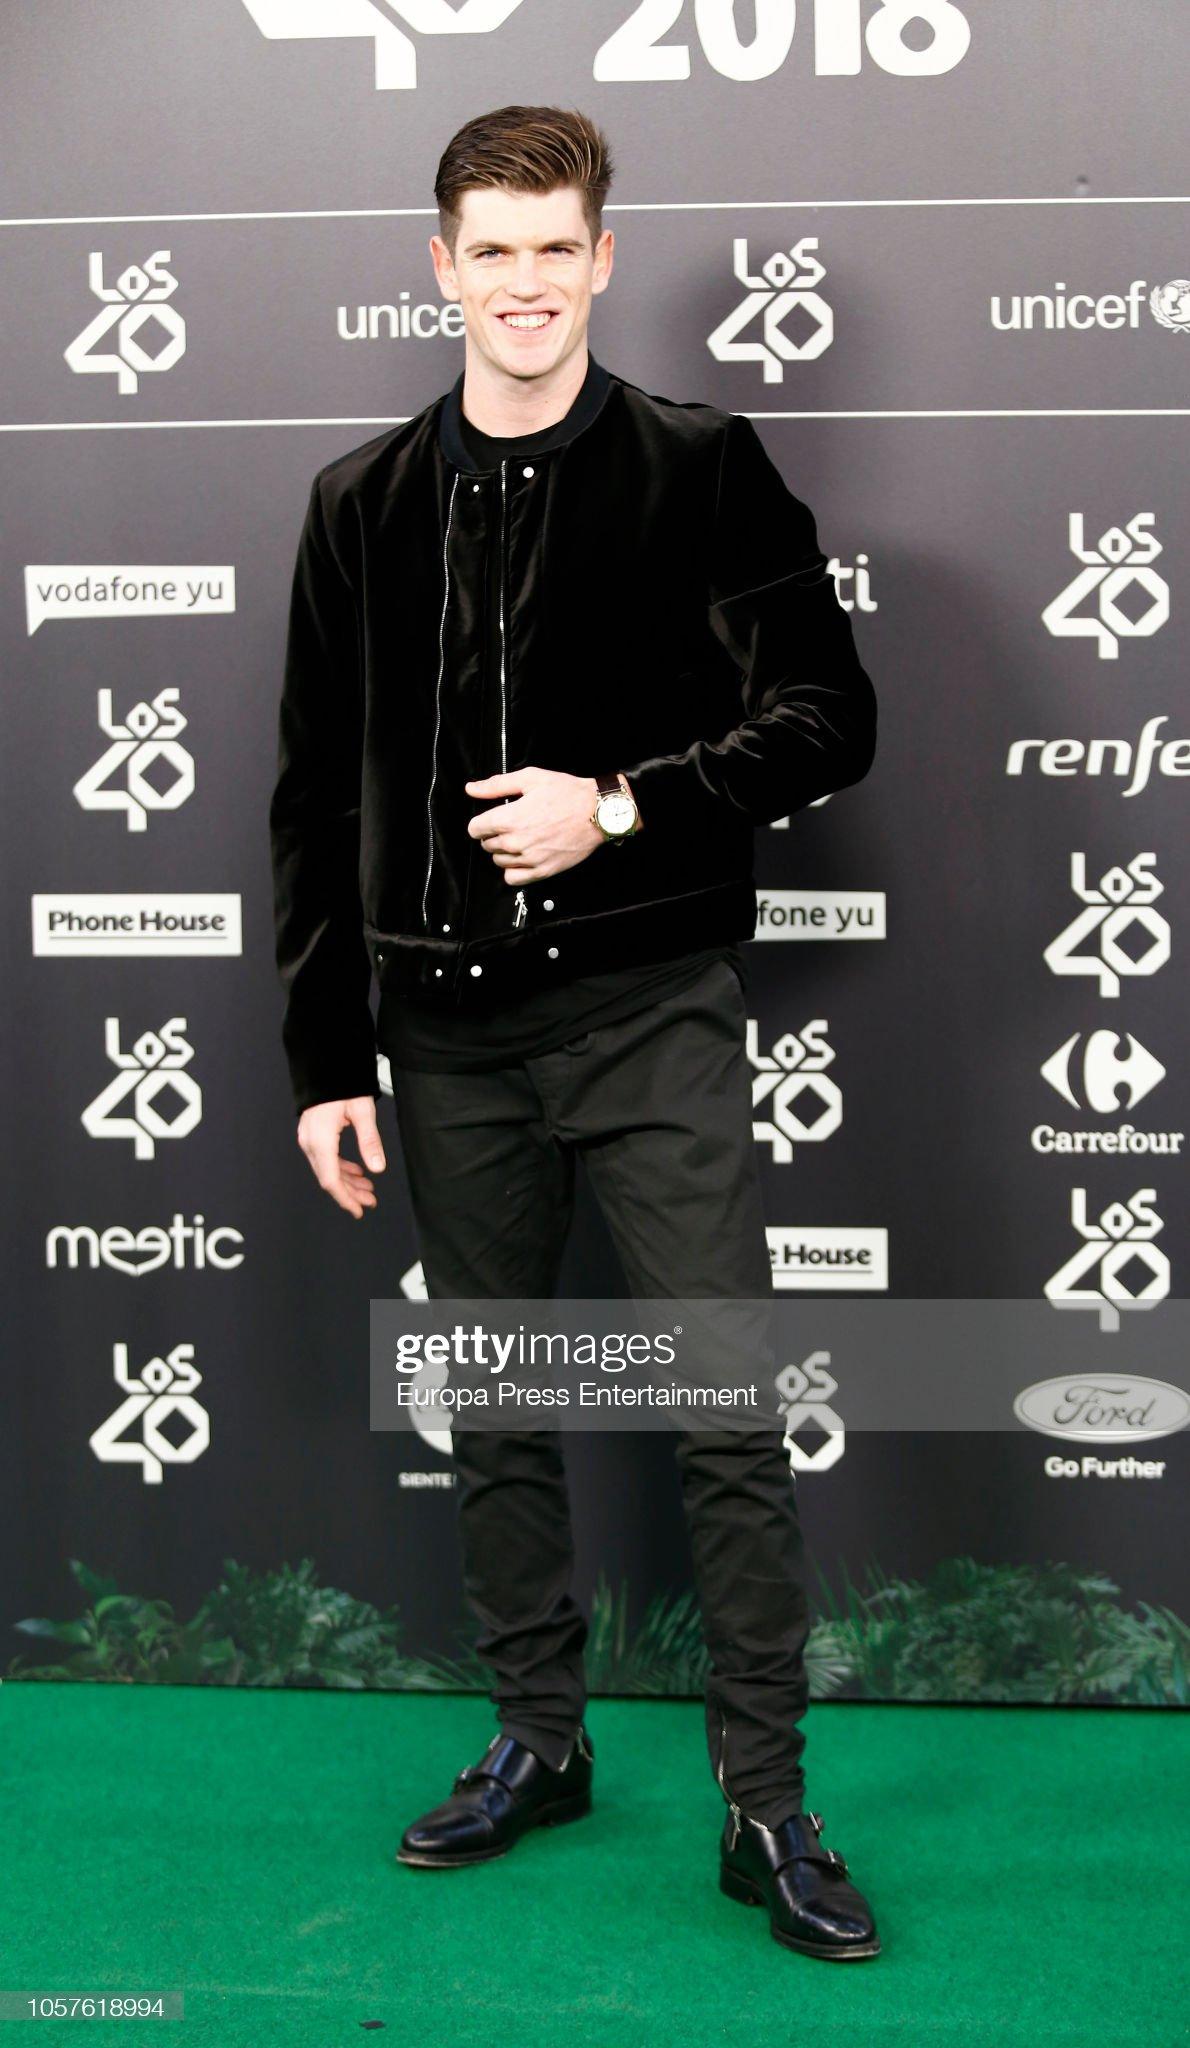 ¿Cuánto mide Miguel Bernardeau?  - Altura: 1,79 Miguel-bernardeau-attends-los40-music-awards-2018-at-wizink-center-on-picture-id1057618994?s=2048x2048